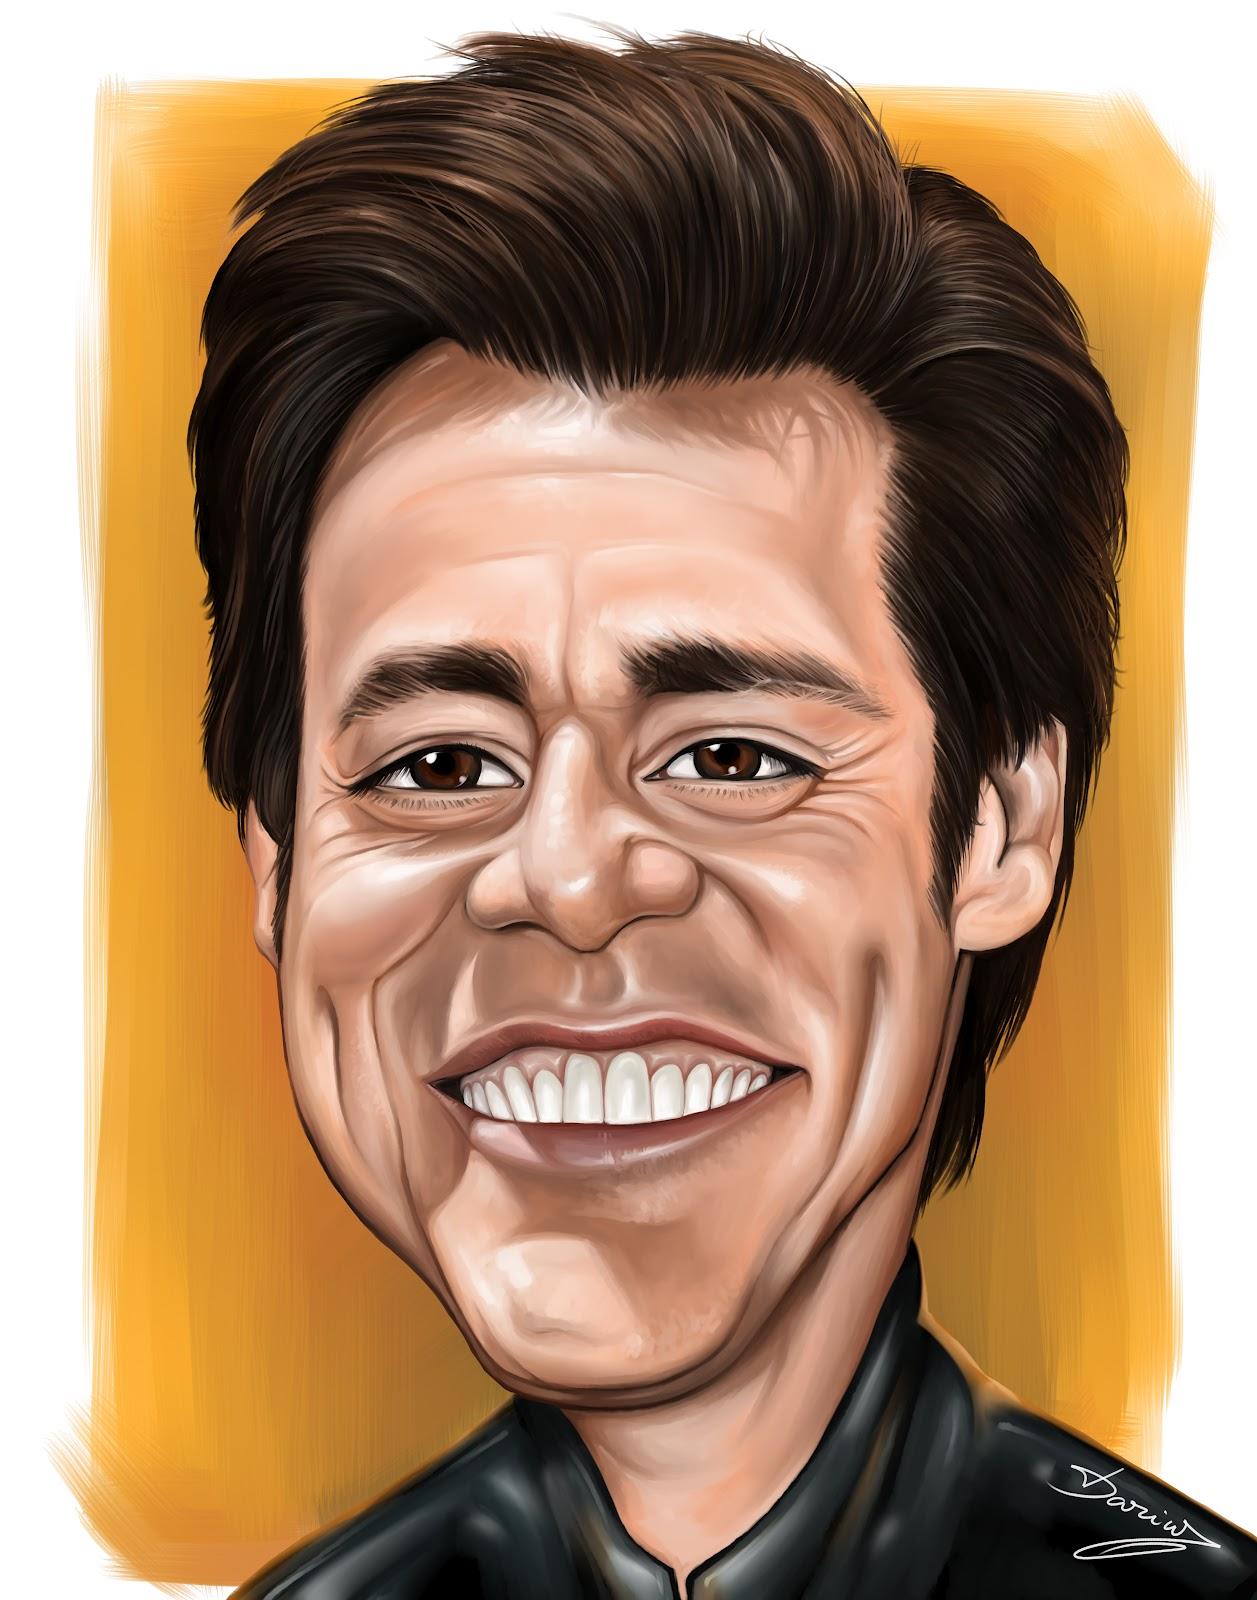 http://4.bp.blogspot.com/-_PPWlQEOmDo/UCUaLG_R7HI/AAAAAAAAAJg/pZzPe7KhD1Y/s1600/Jim-Carrey-Caricature.jpg